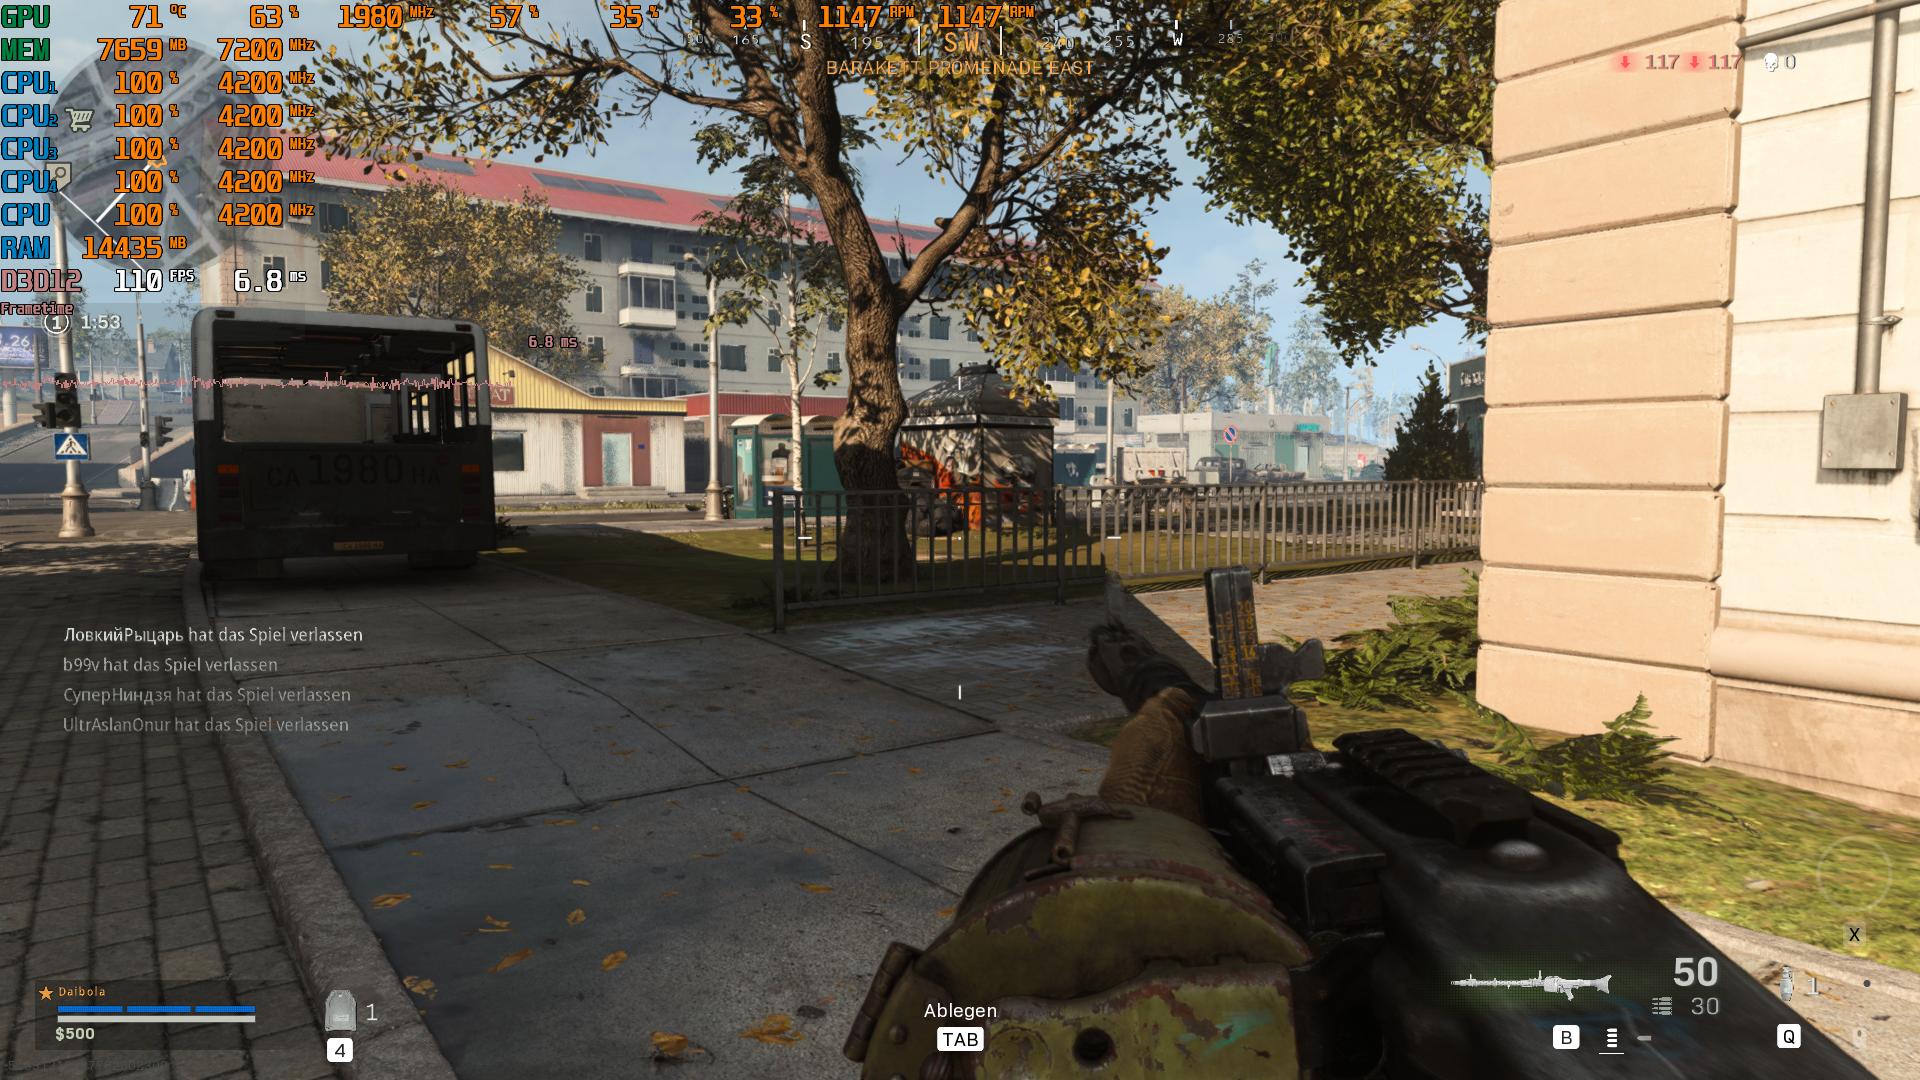 Call of Duty  Modern Warfare 2019 Screenshot 2020.03.26 - 06.41.35.65.png